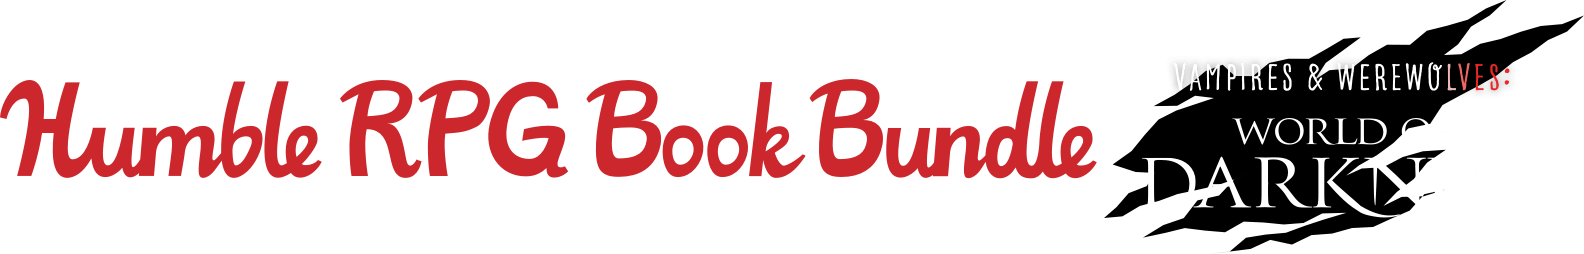 Humble RPG Book Bundle: Vampires & Werewolves - A World of Darkness